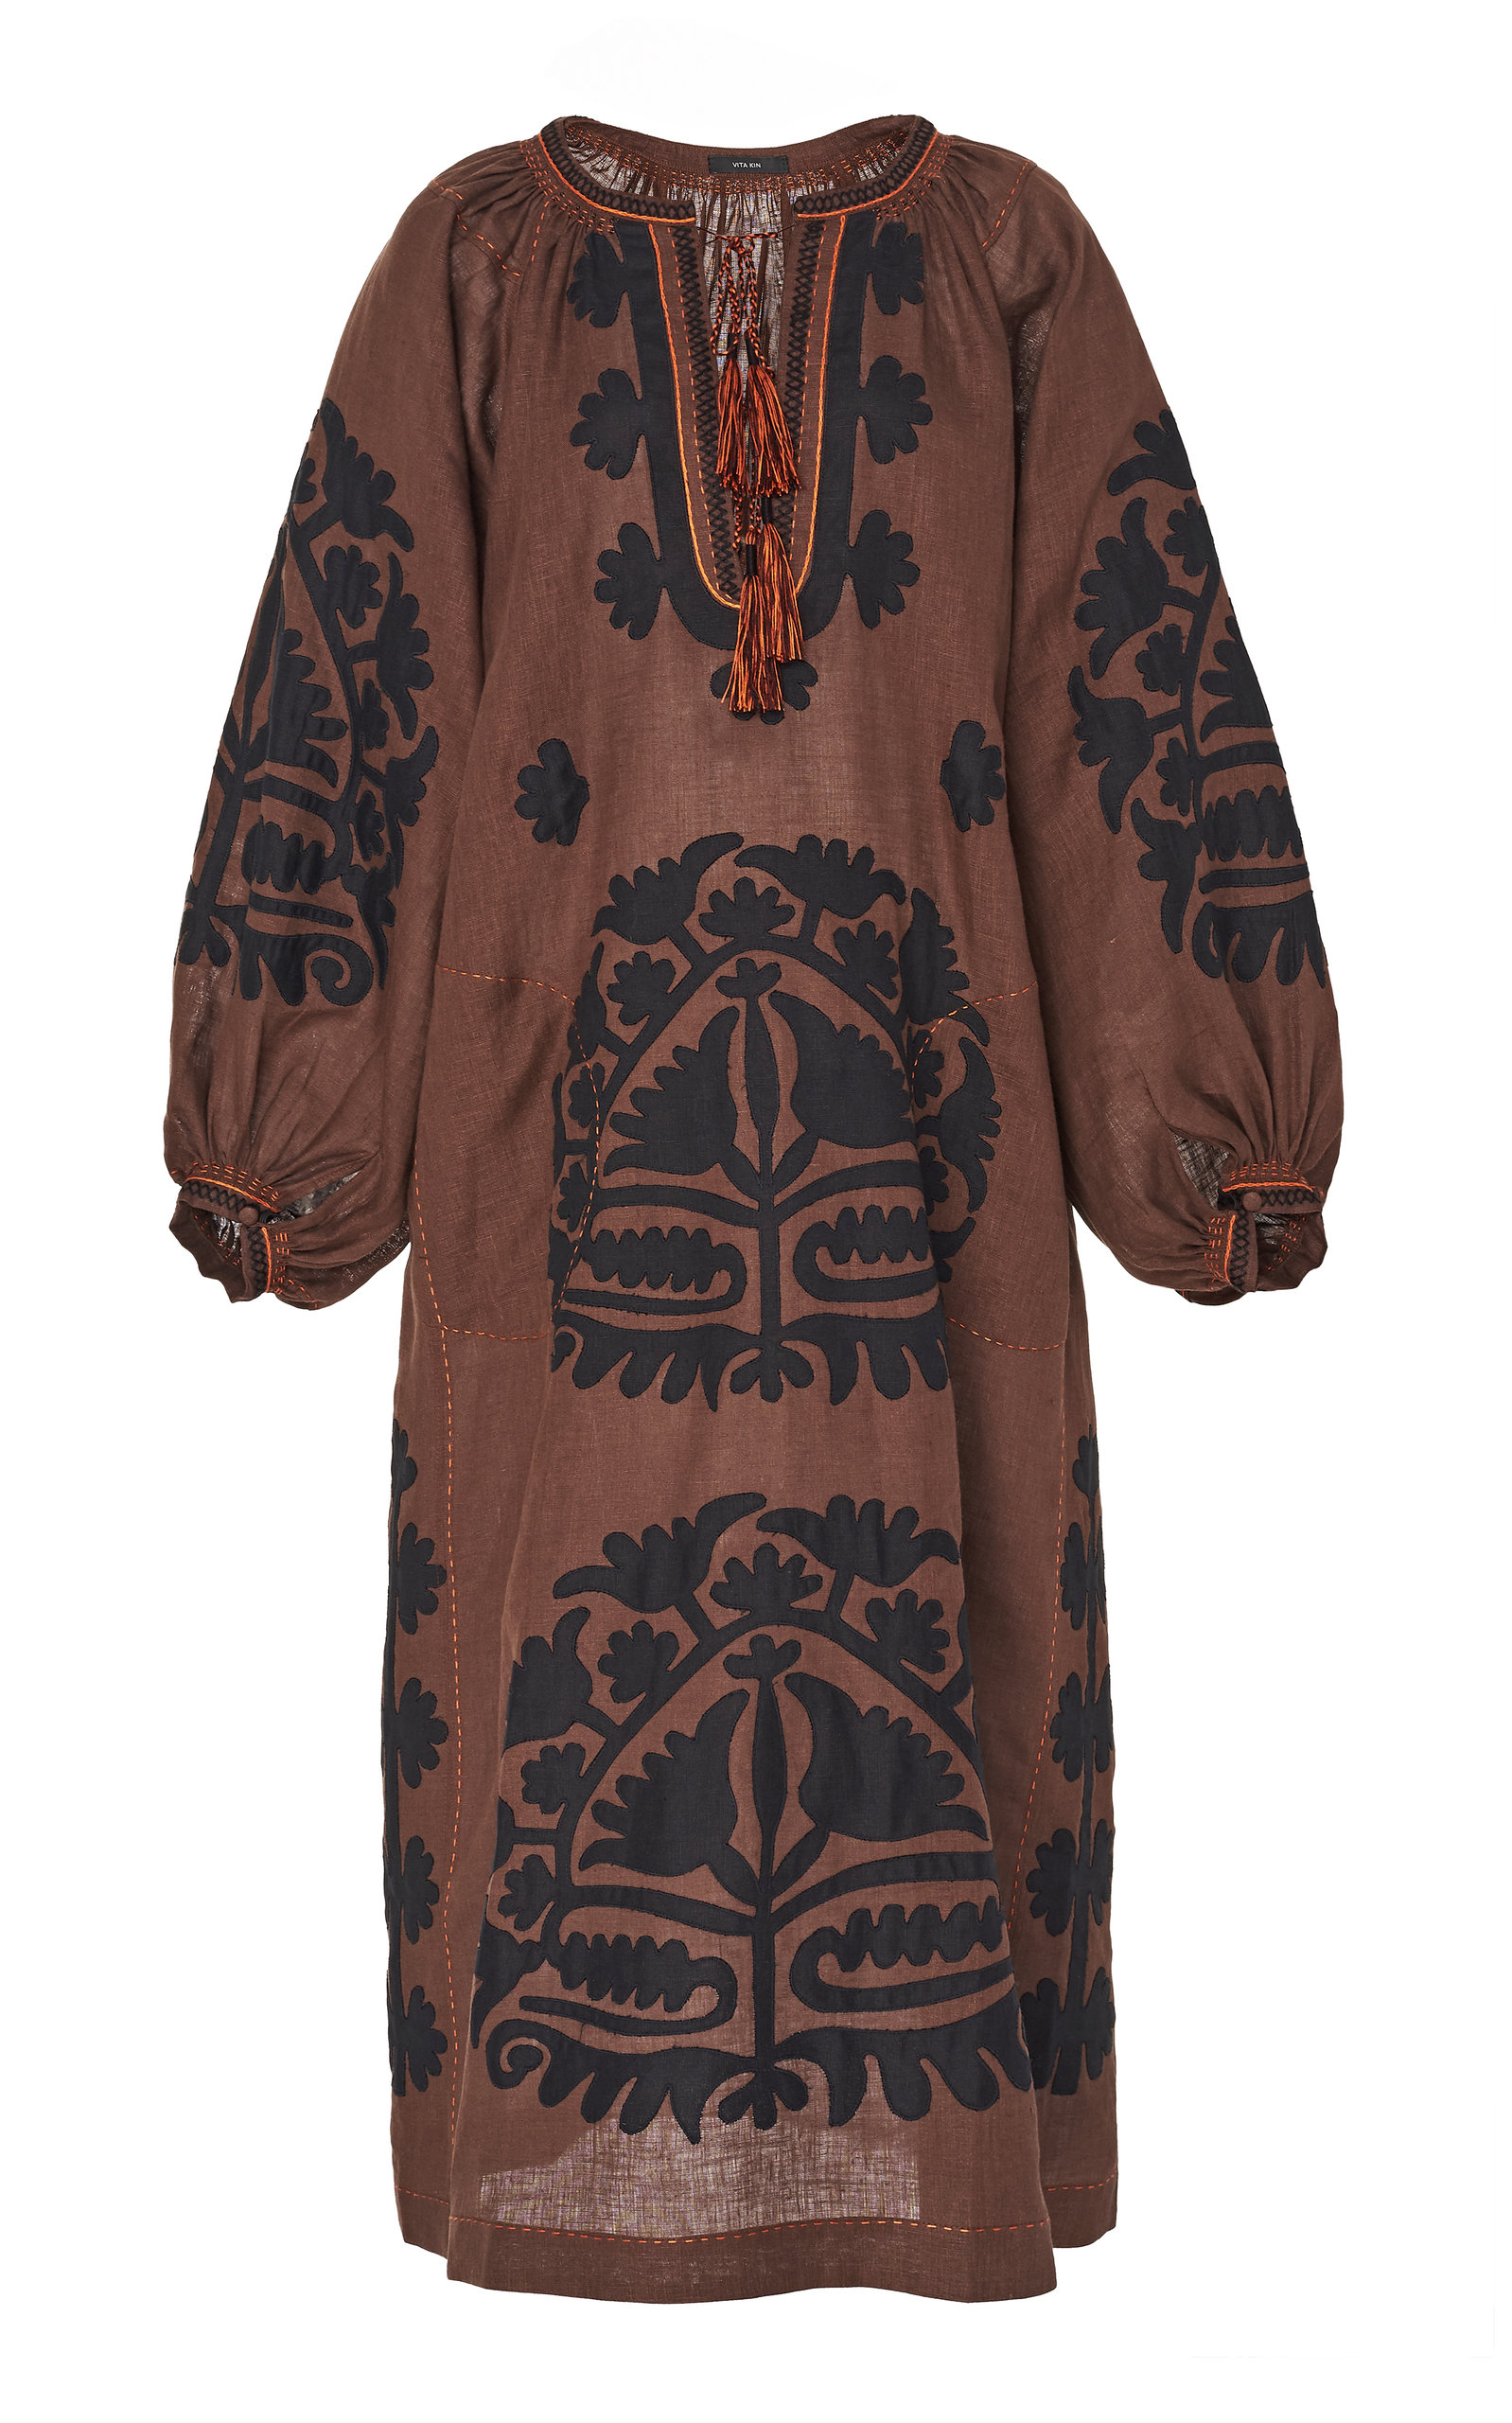 Buy Vita Kin Shalimar Appliquéd Embroidered Linen Midi Dress online, shop Vita Kin at the best price